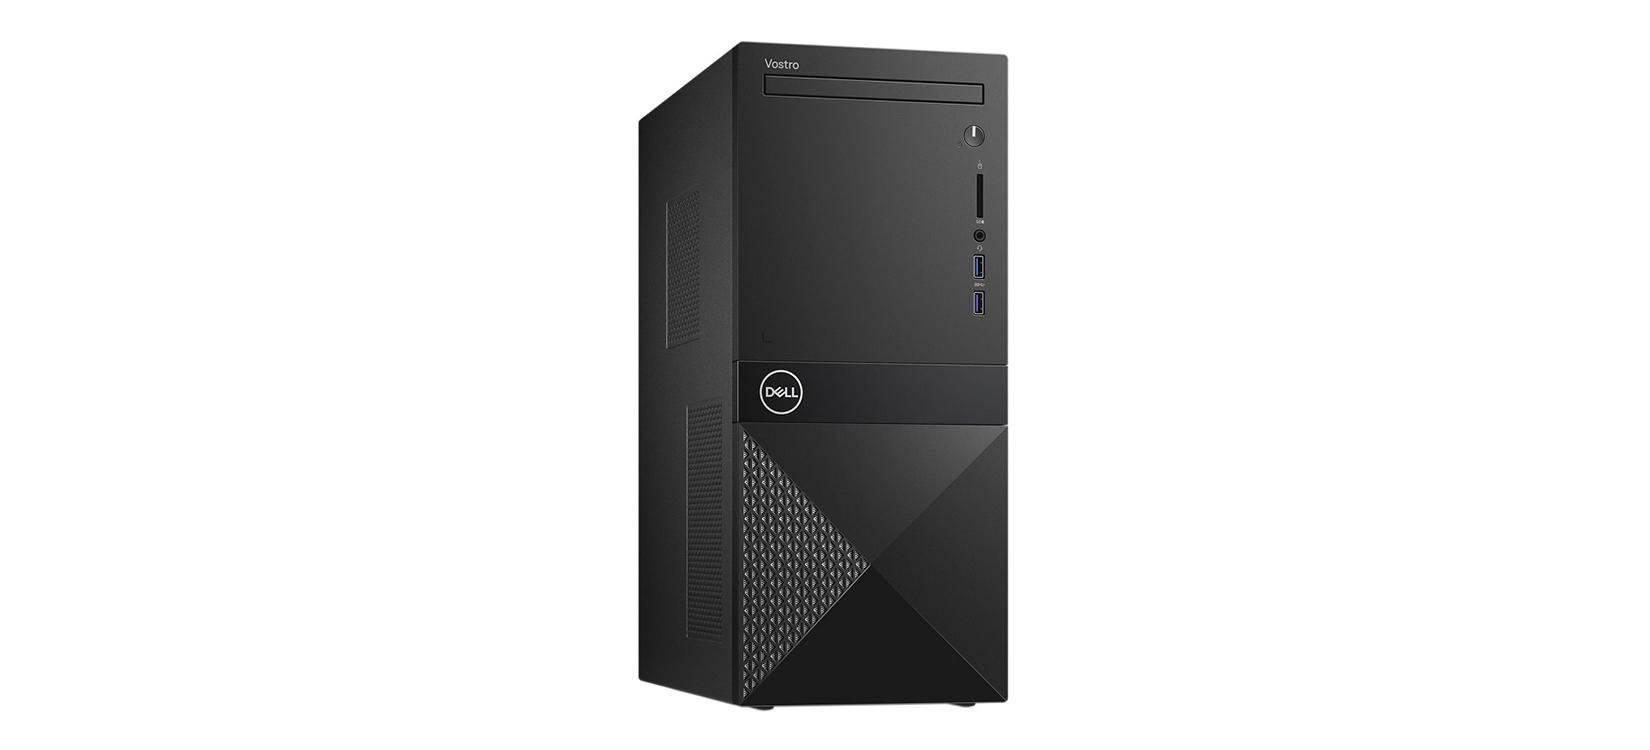 PC Dell Vostro 3671 (i3-9100/4GB RAM/1TB HDD/DVDRW/WL+BT/K+M/Win 10) (42VT370047) - hakivn